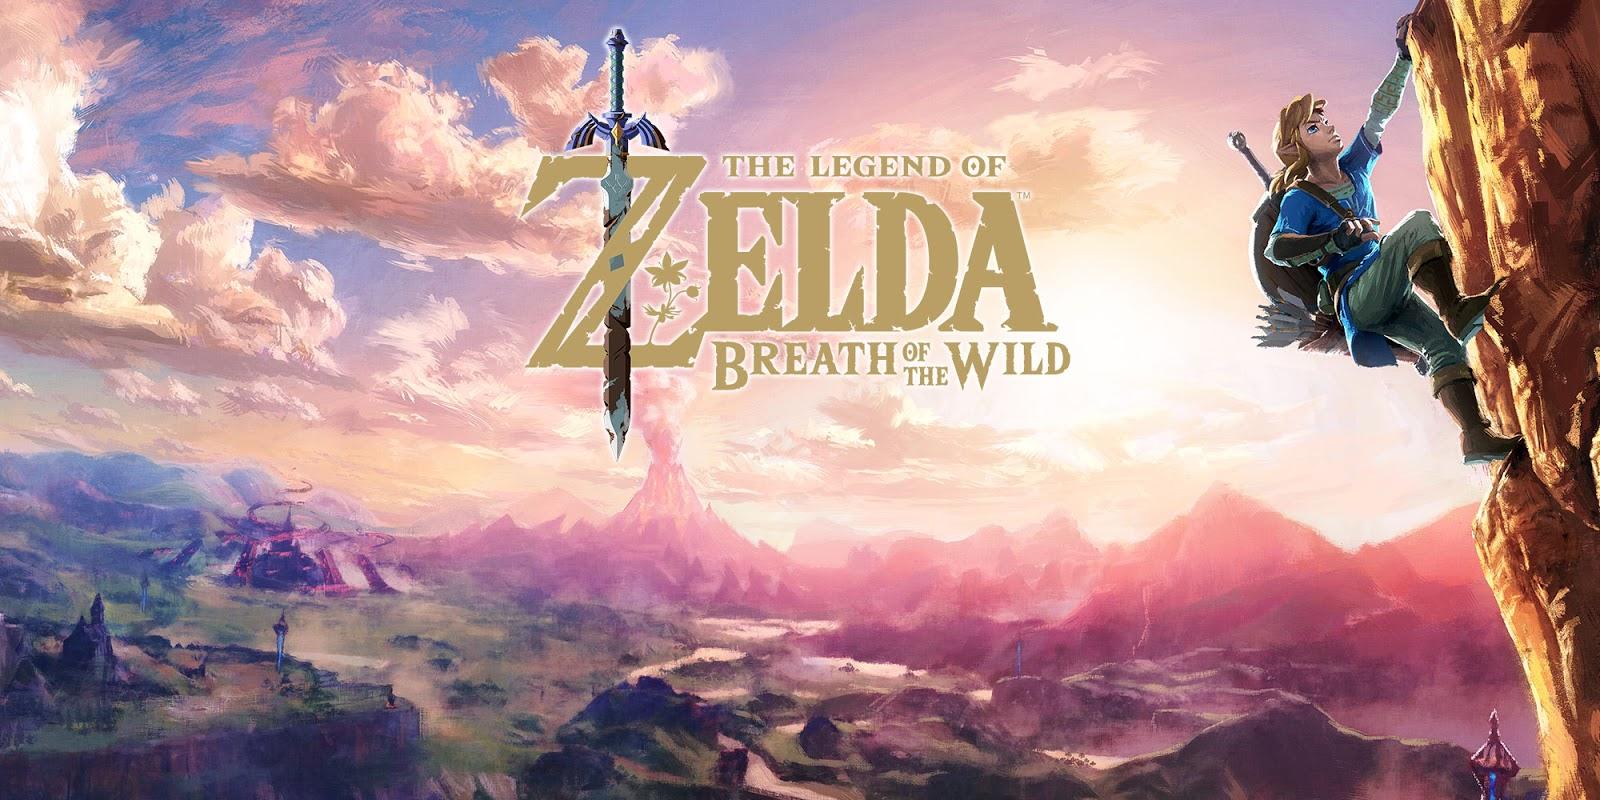 Logran superar The Legend of Zelda: Breath of the wild en 58 minutos